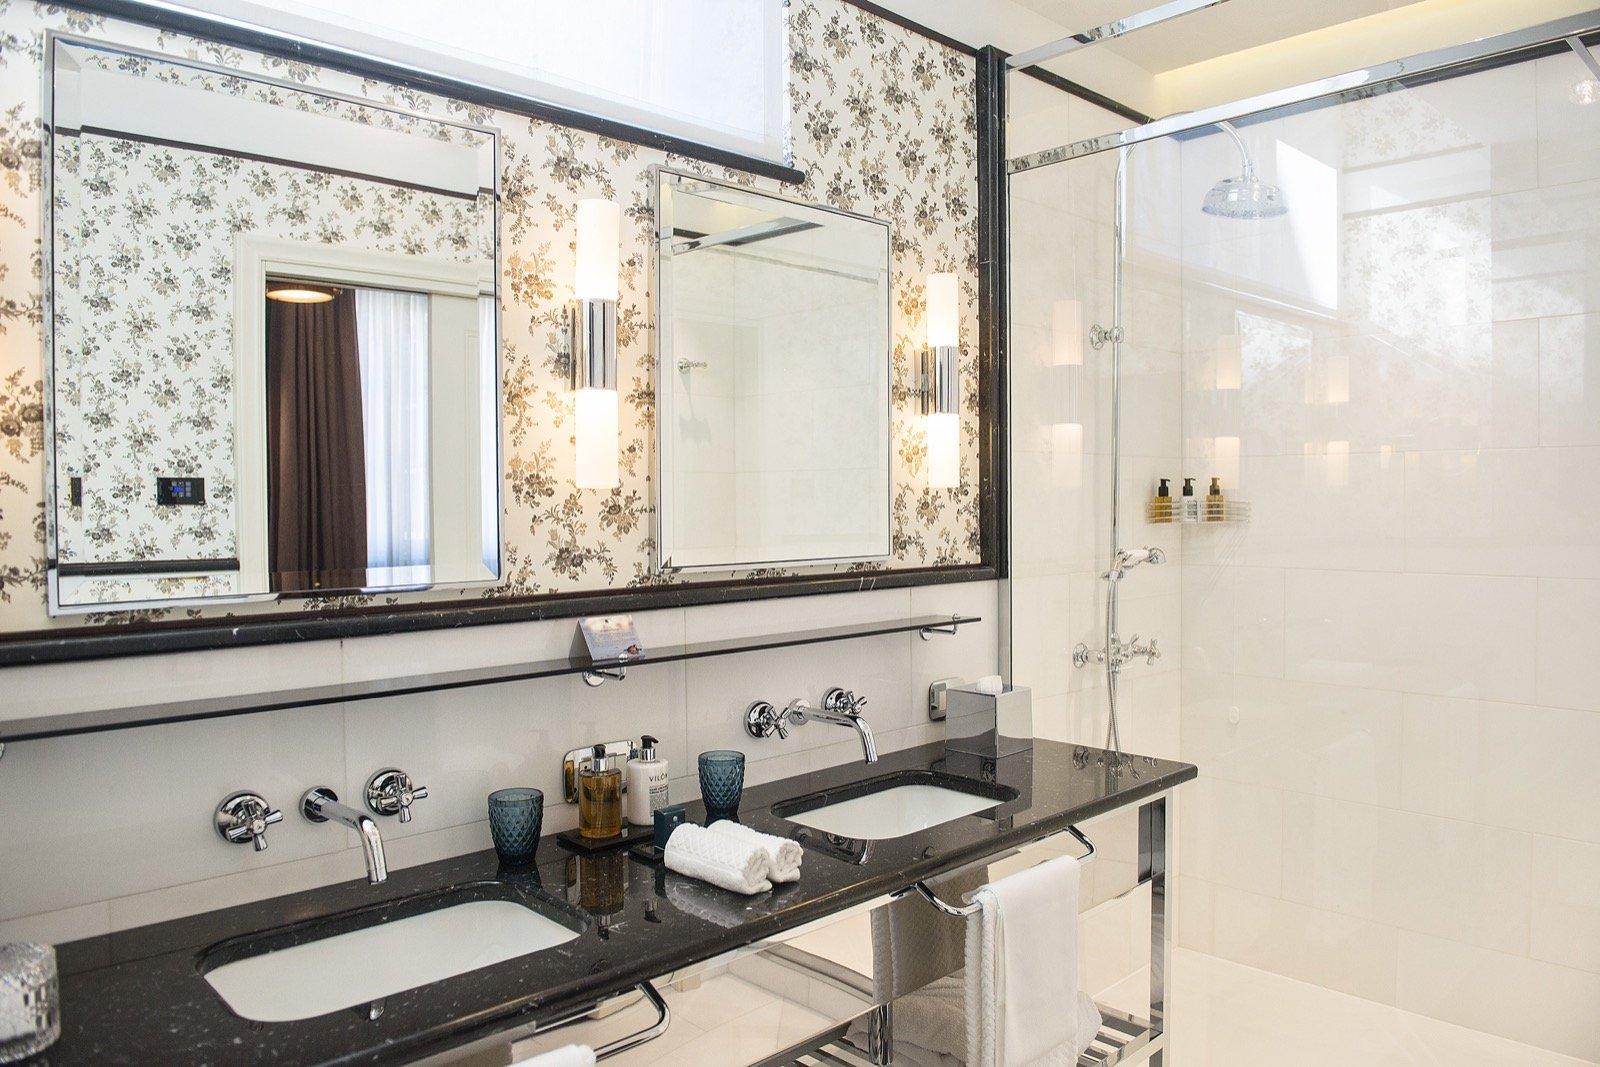 Bagni Da Sogno Classiche : Progettazione bagni residenziali firenze studio anichini